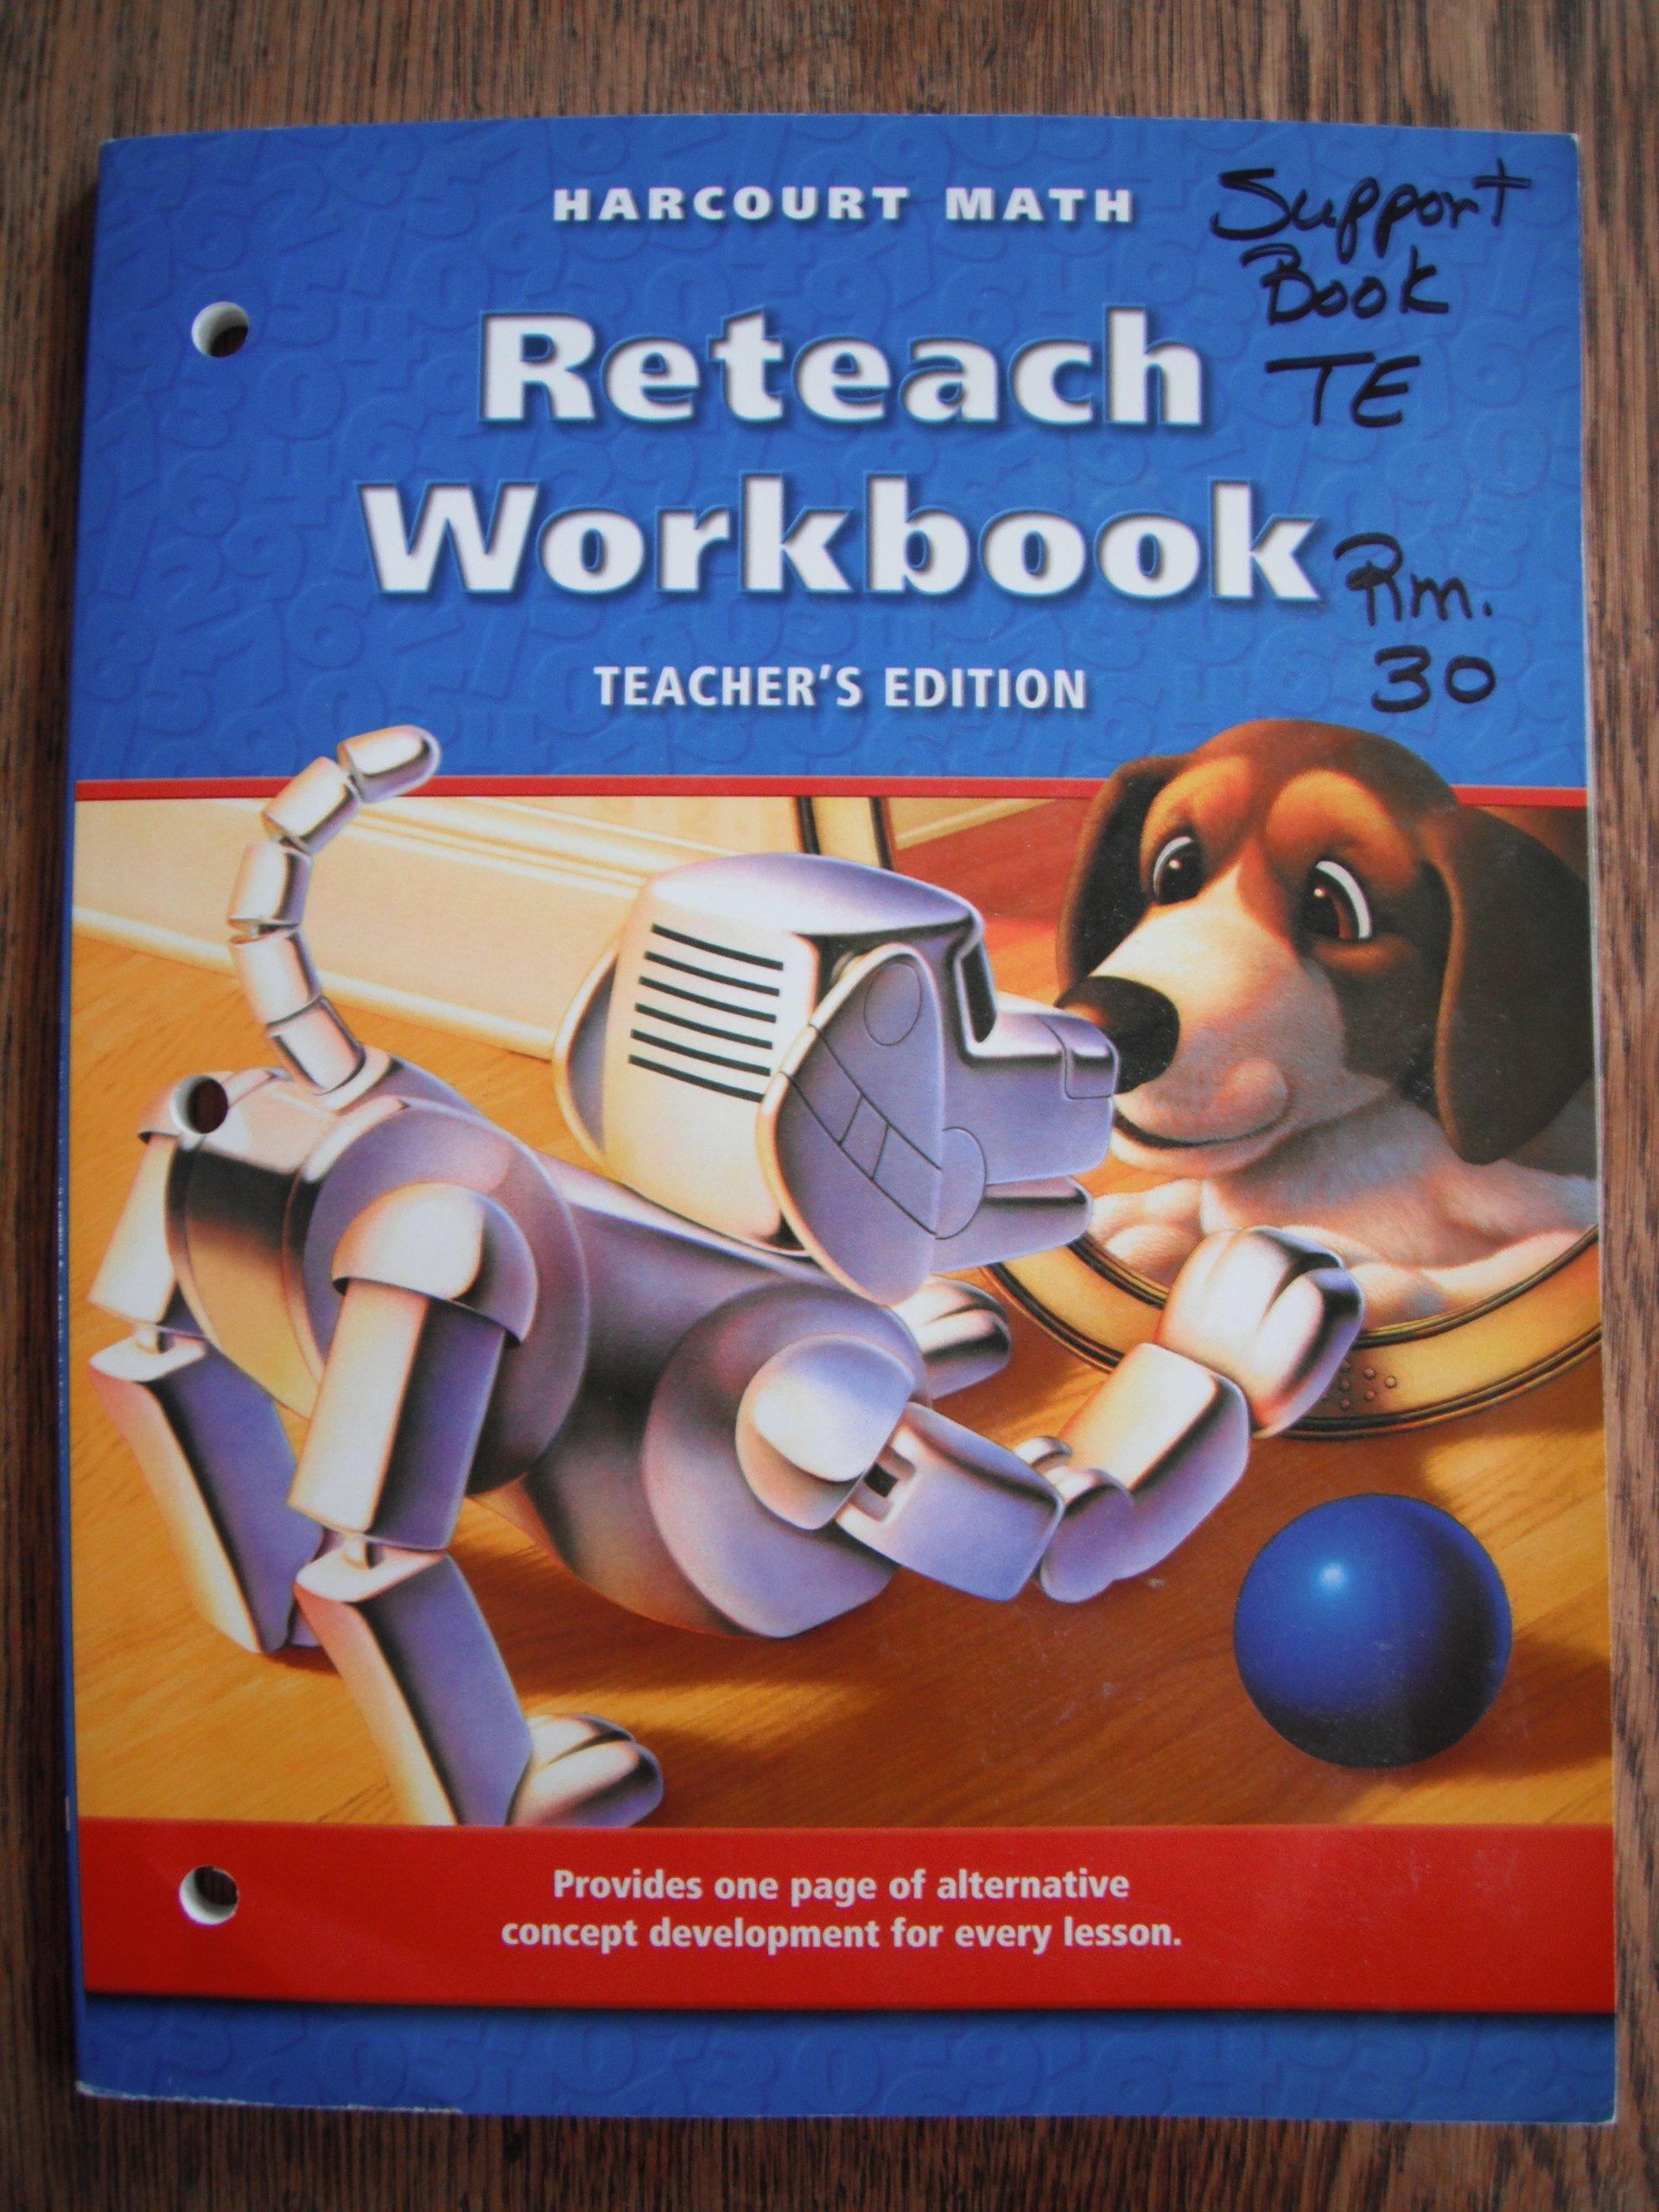 Harcourt Math Reteach Workbook Teacher's Edition Grade 3 California Ed.:  9780153206672: Amazon.com: Books